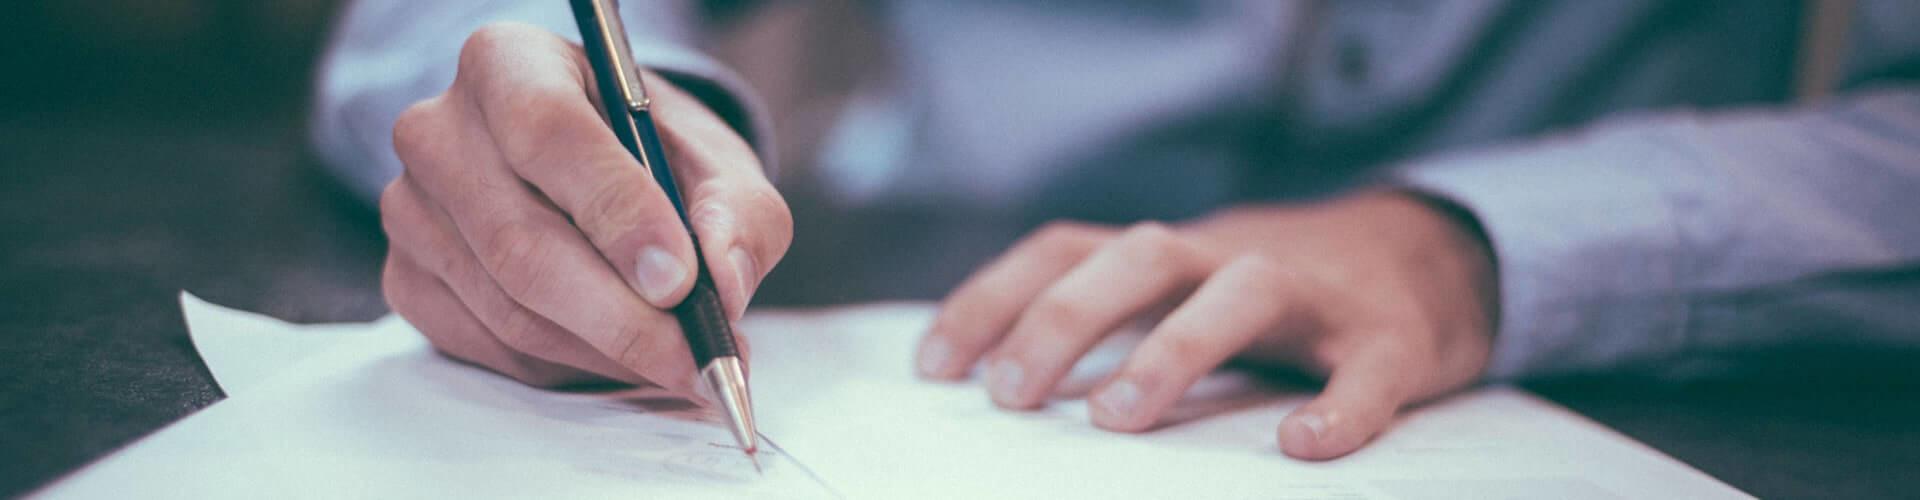 curriculum vitae czy si  podpisuje